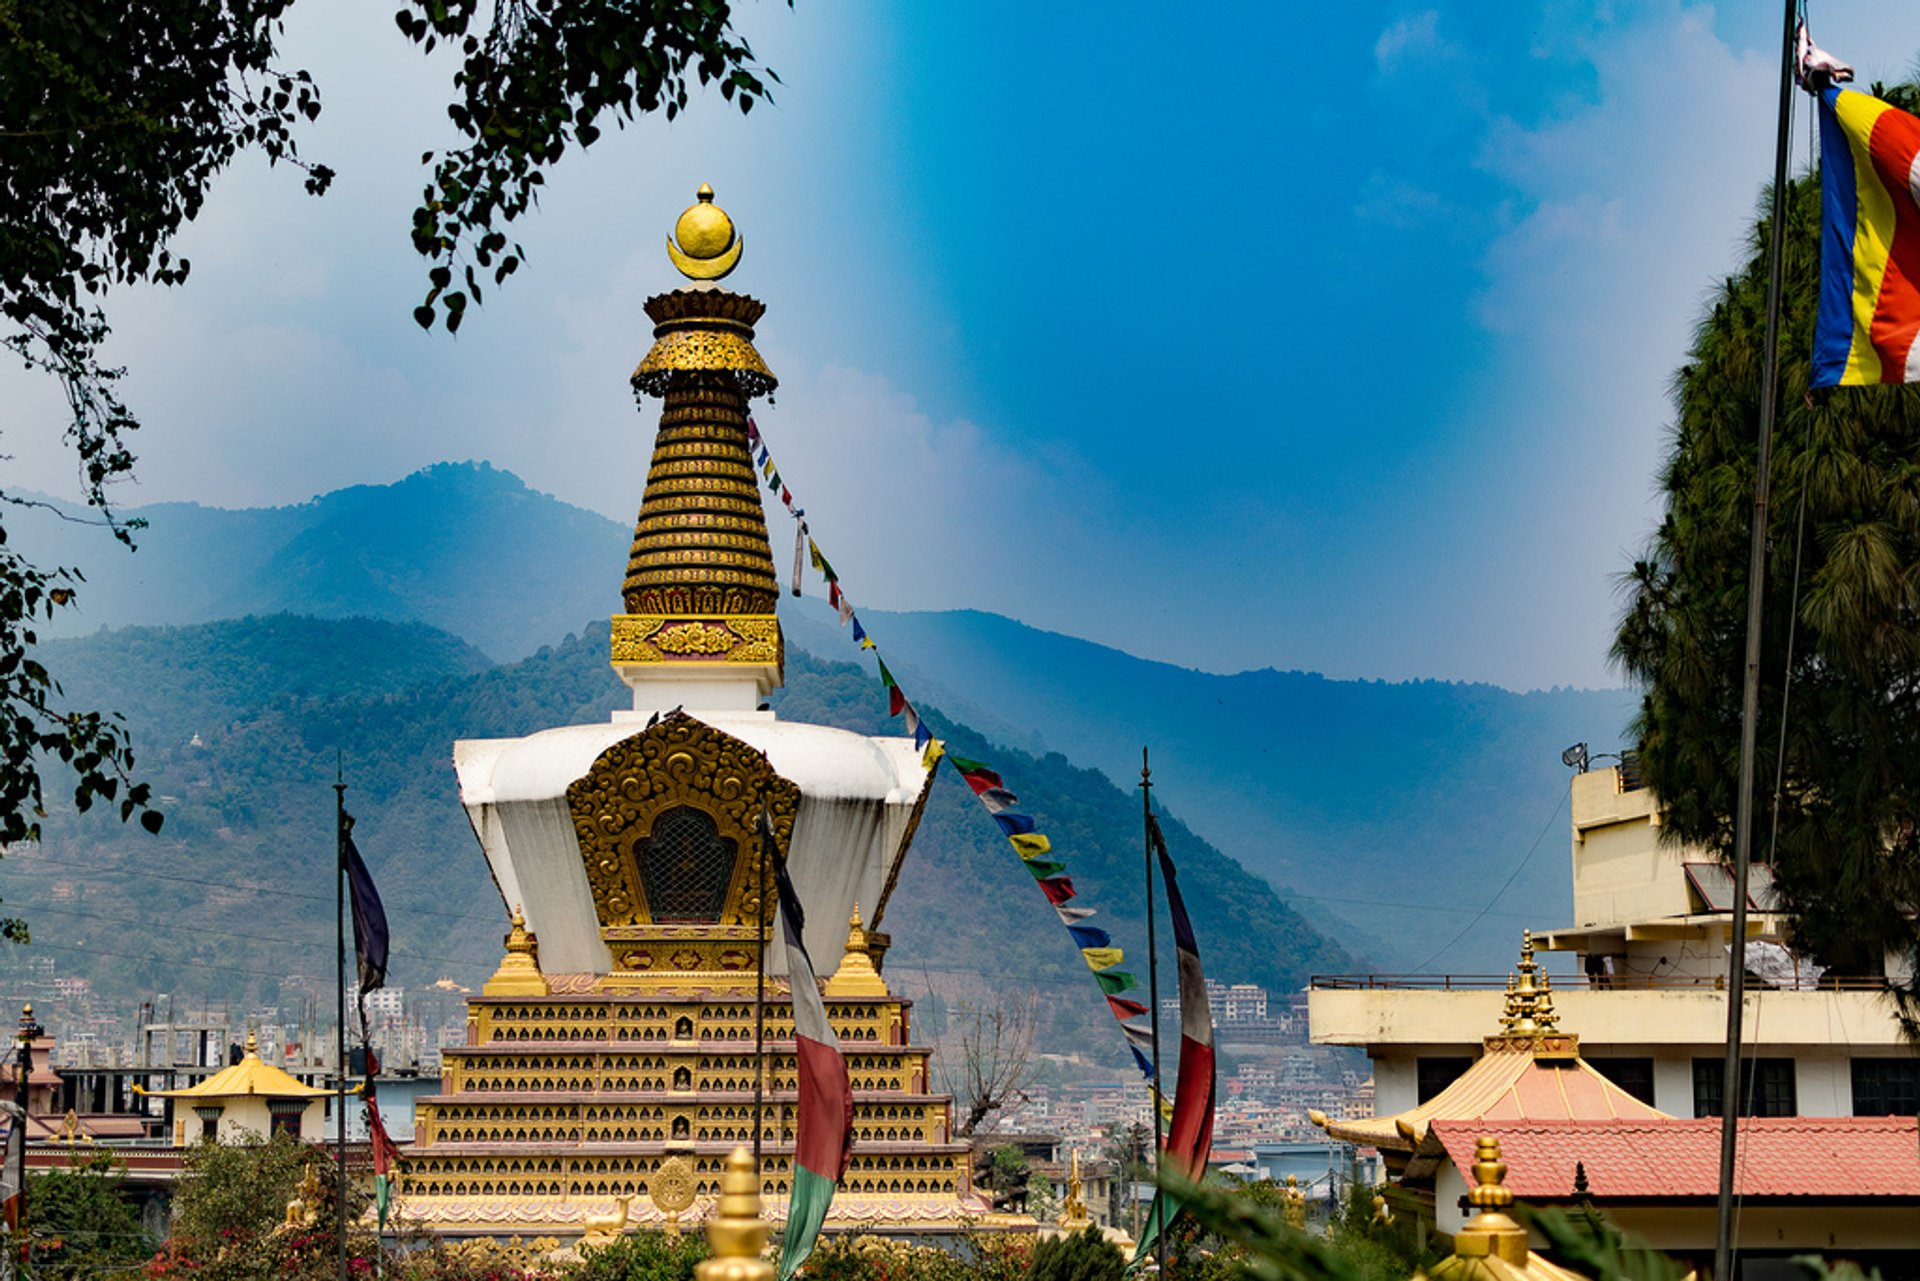 Best time for Swayambhunath (Monkey Temple) in Kathmandu 2019